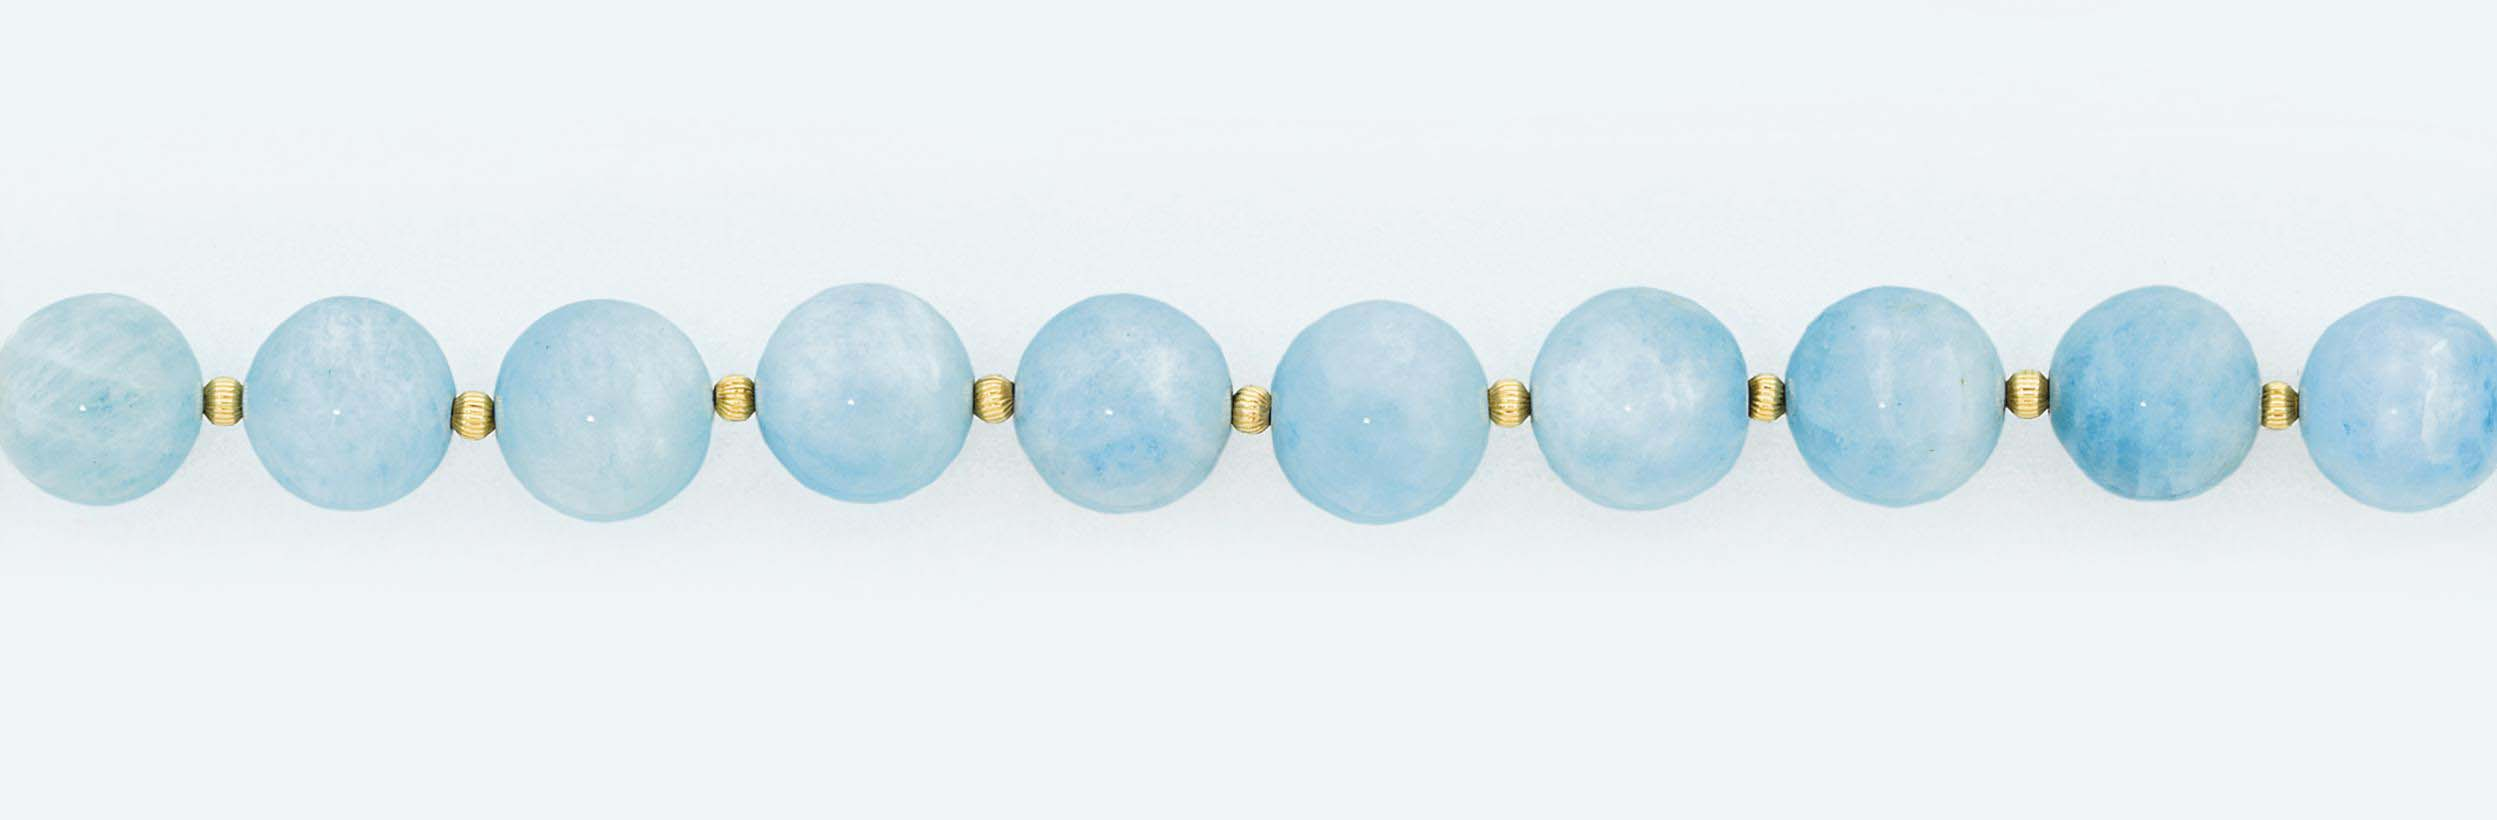 An aquamarine bead necklace an